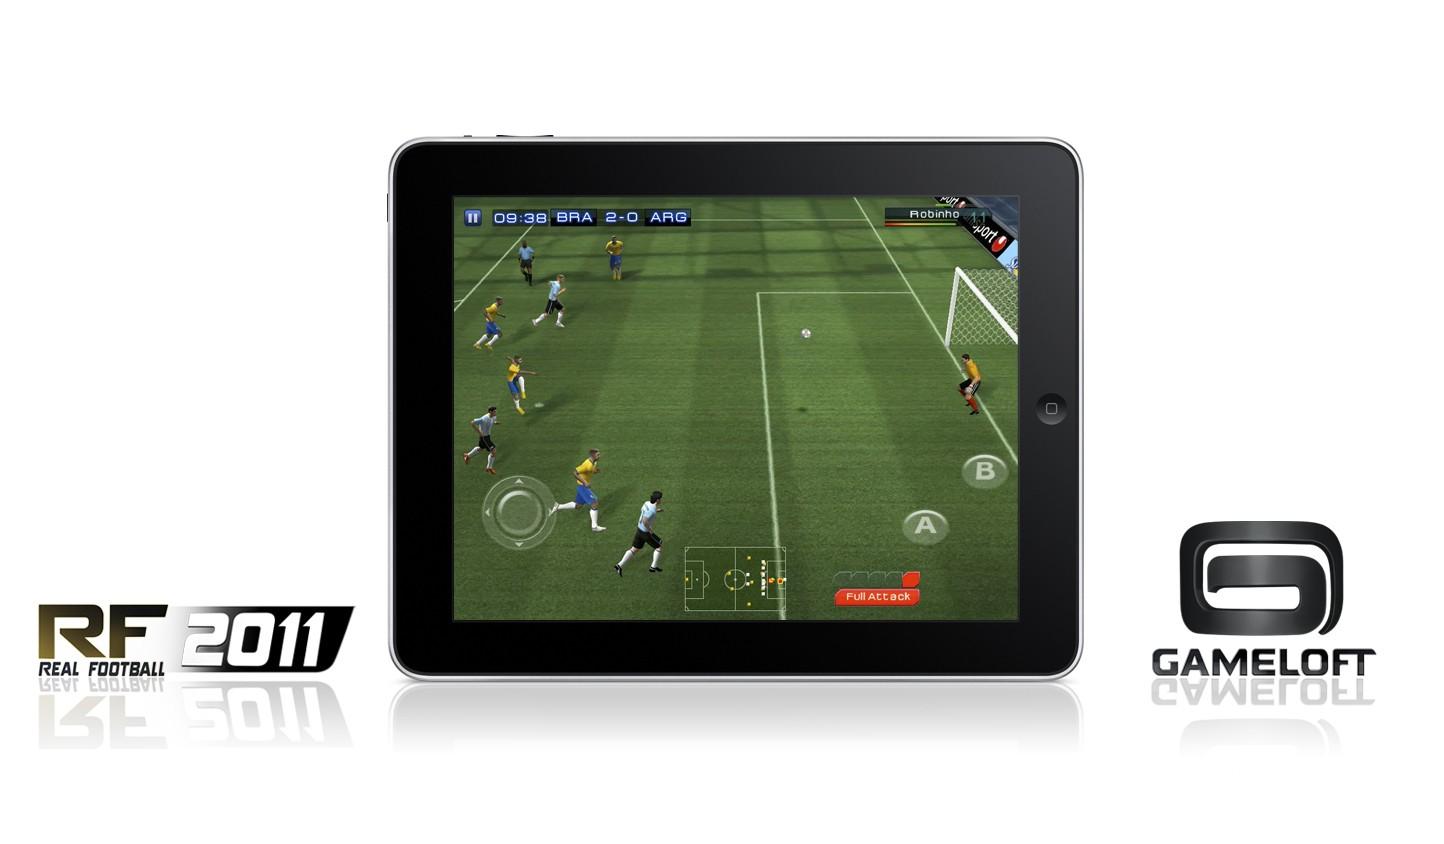 Real Football 2011 - Prime immagini